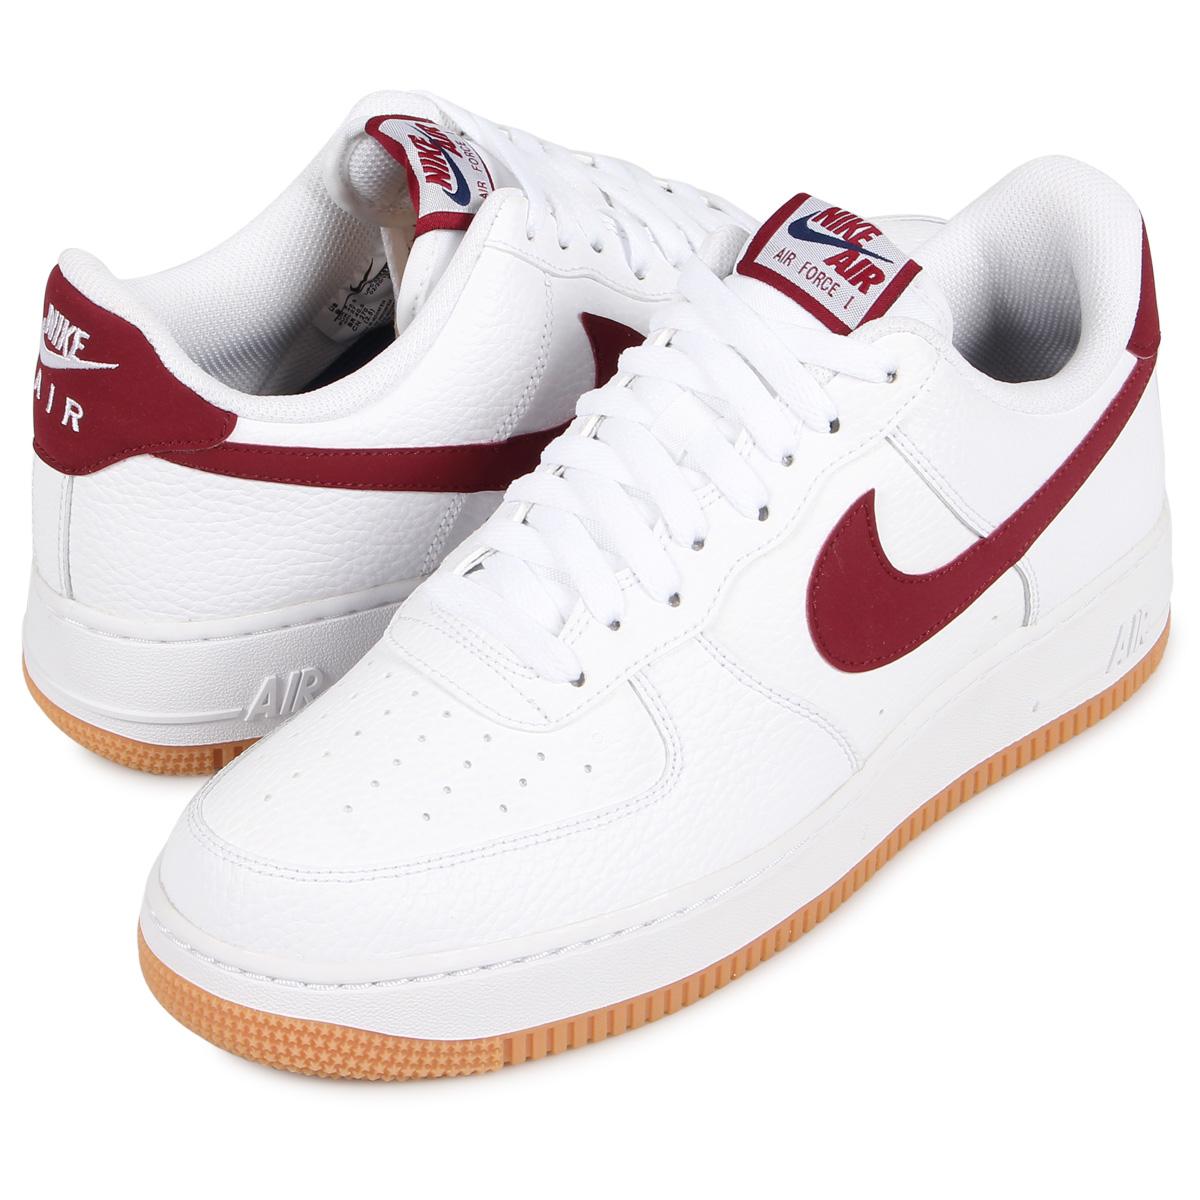 Nike NIKE air force 1 sneakers men AIR FORCE 1 07 white white CI0057 101 [197]